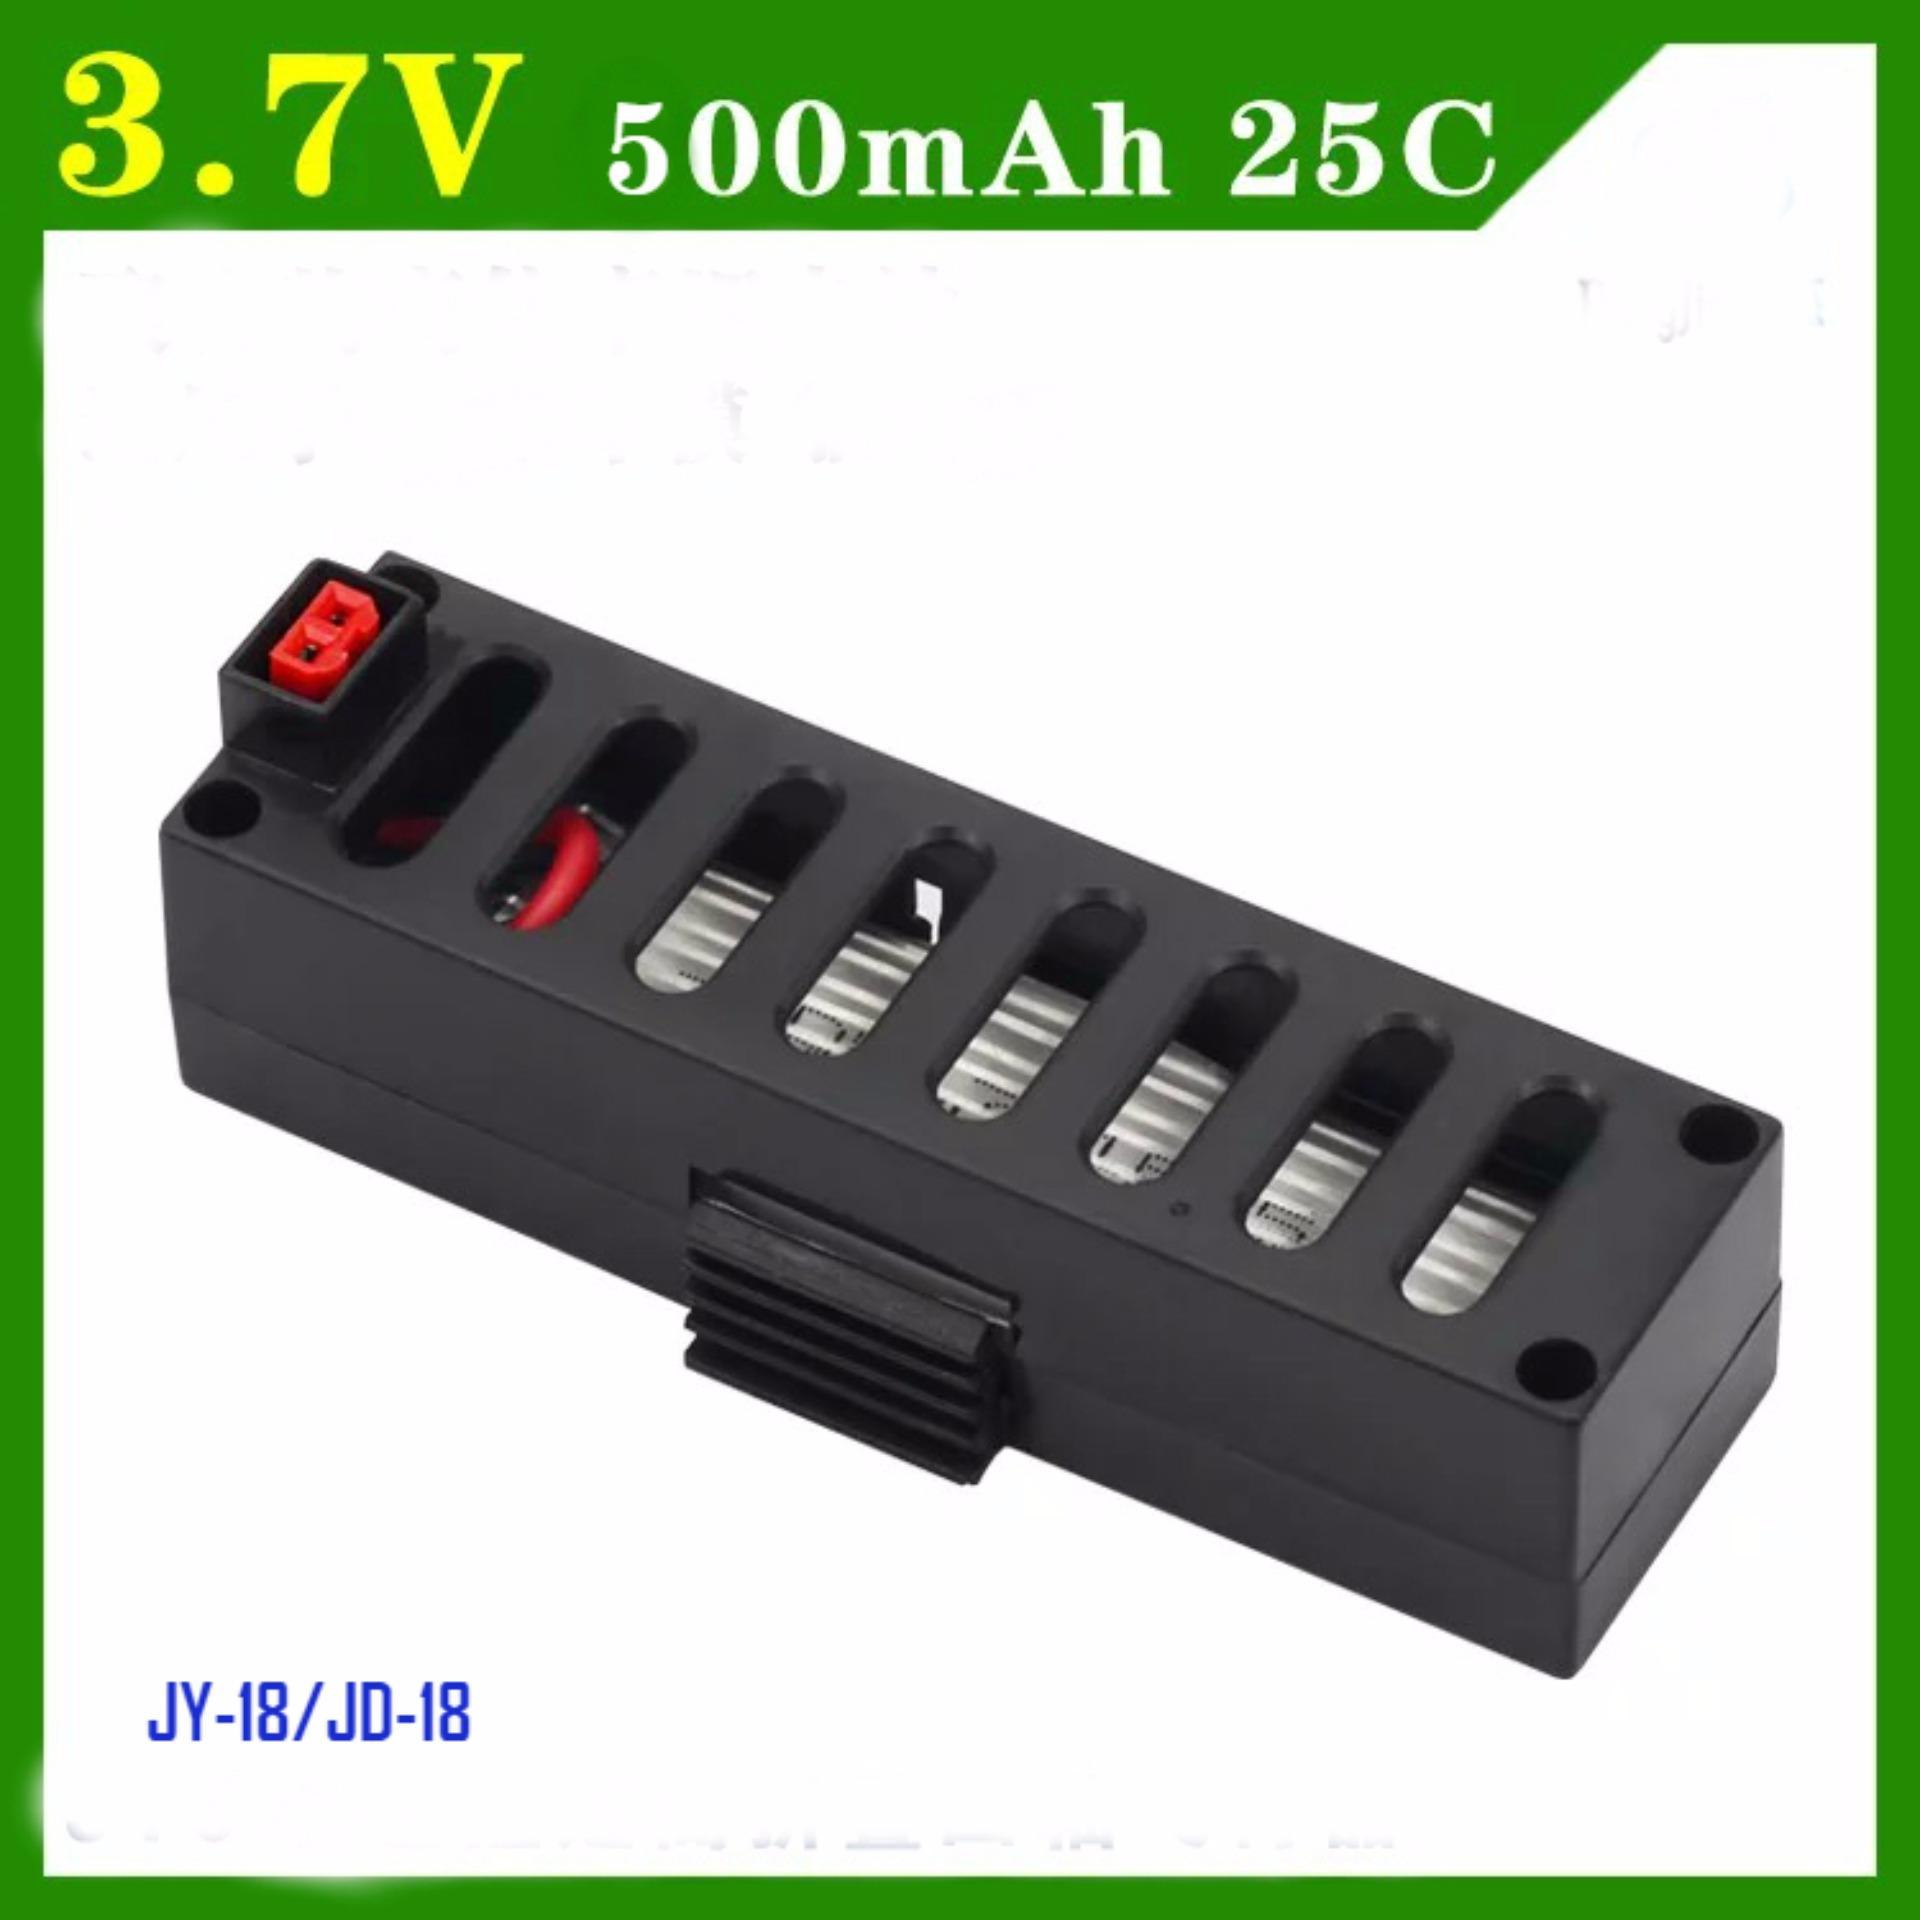 Pin Flycam JD018 / JY018 3.7V 500mAh 25C ( JD 18 / JY 18 )